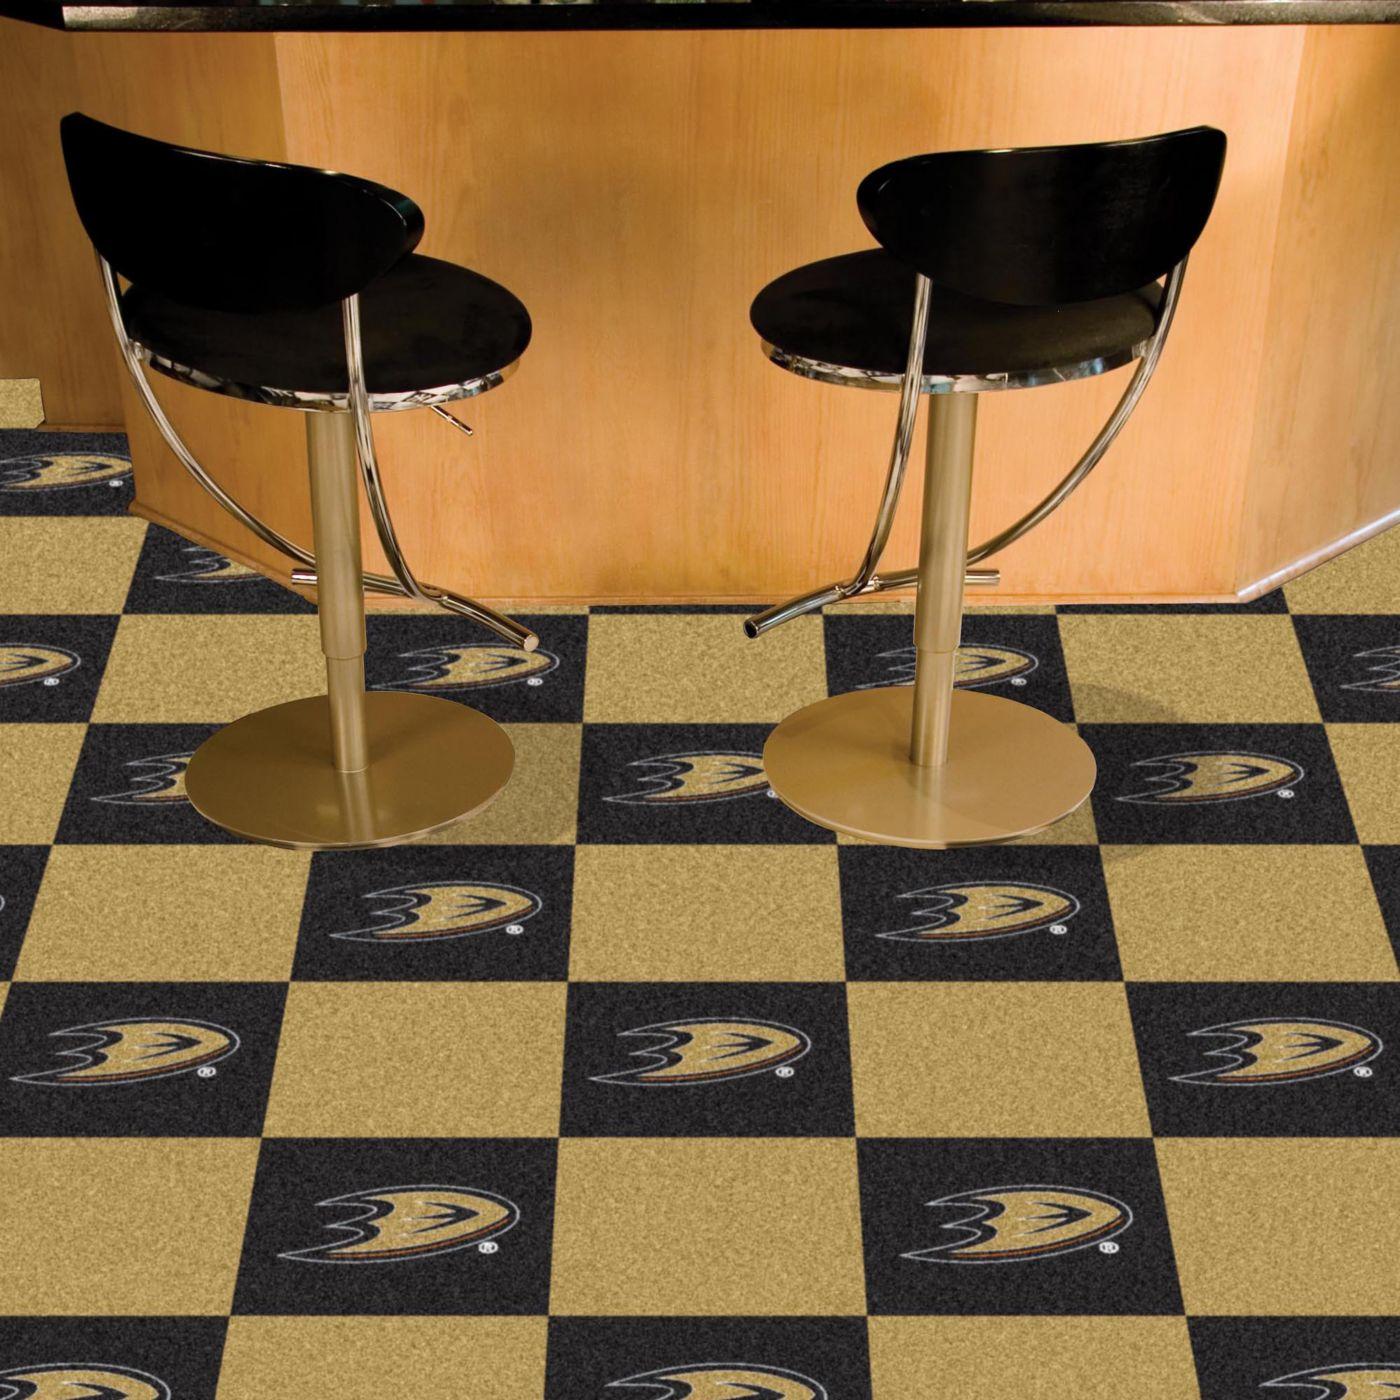 FANMATS Anaheim Ducks Carpet Tiles